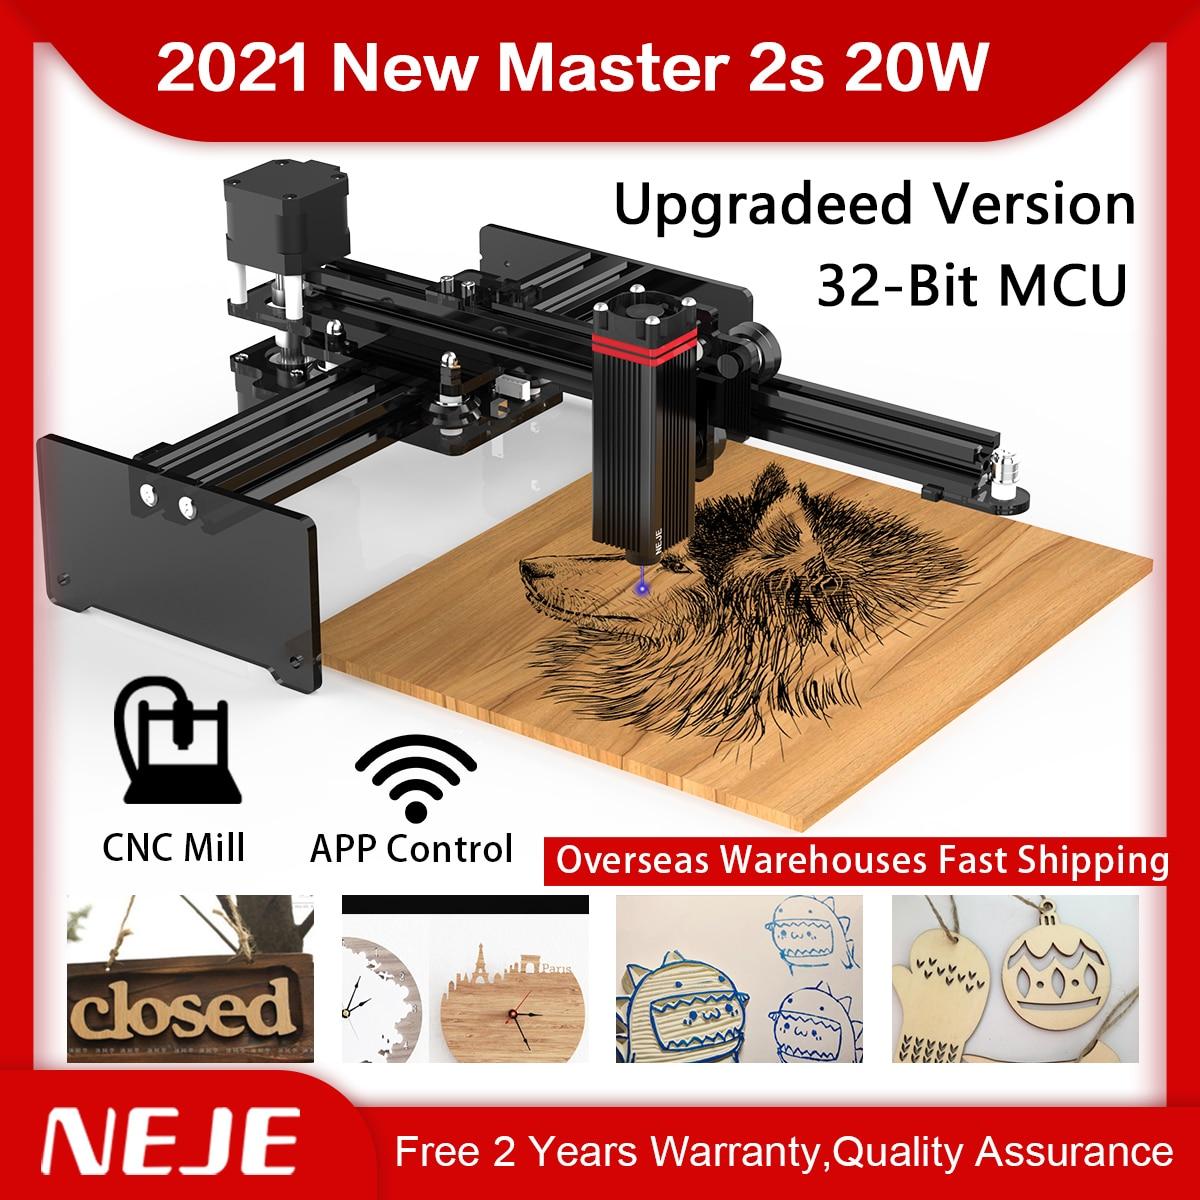 NEJE Master 2S 20W cnc Desktop wireless Laser Engraver Printer with 32Bit Mainboard,Cutter,Wood Router,Engraving,Cutting Machine